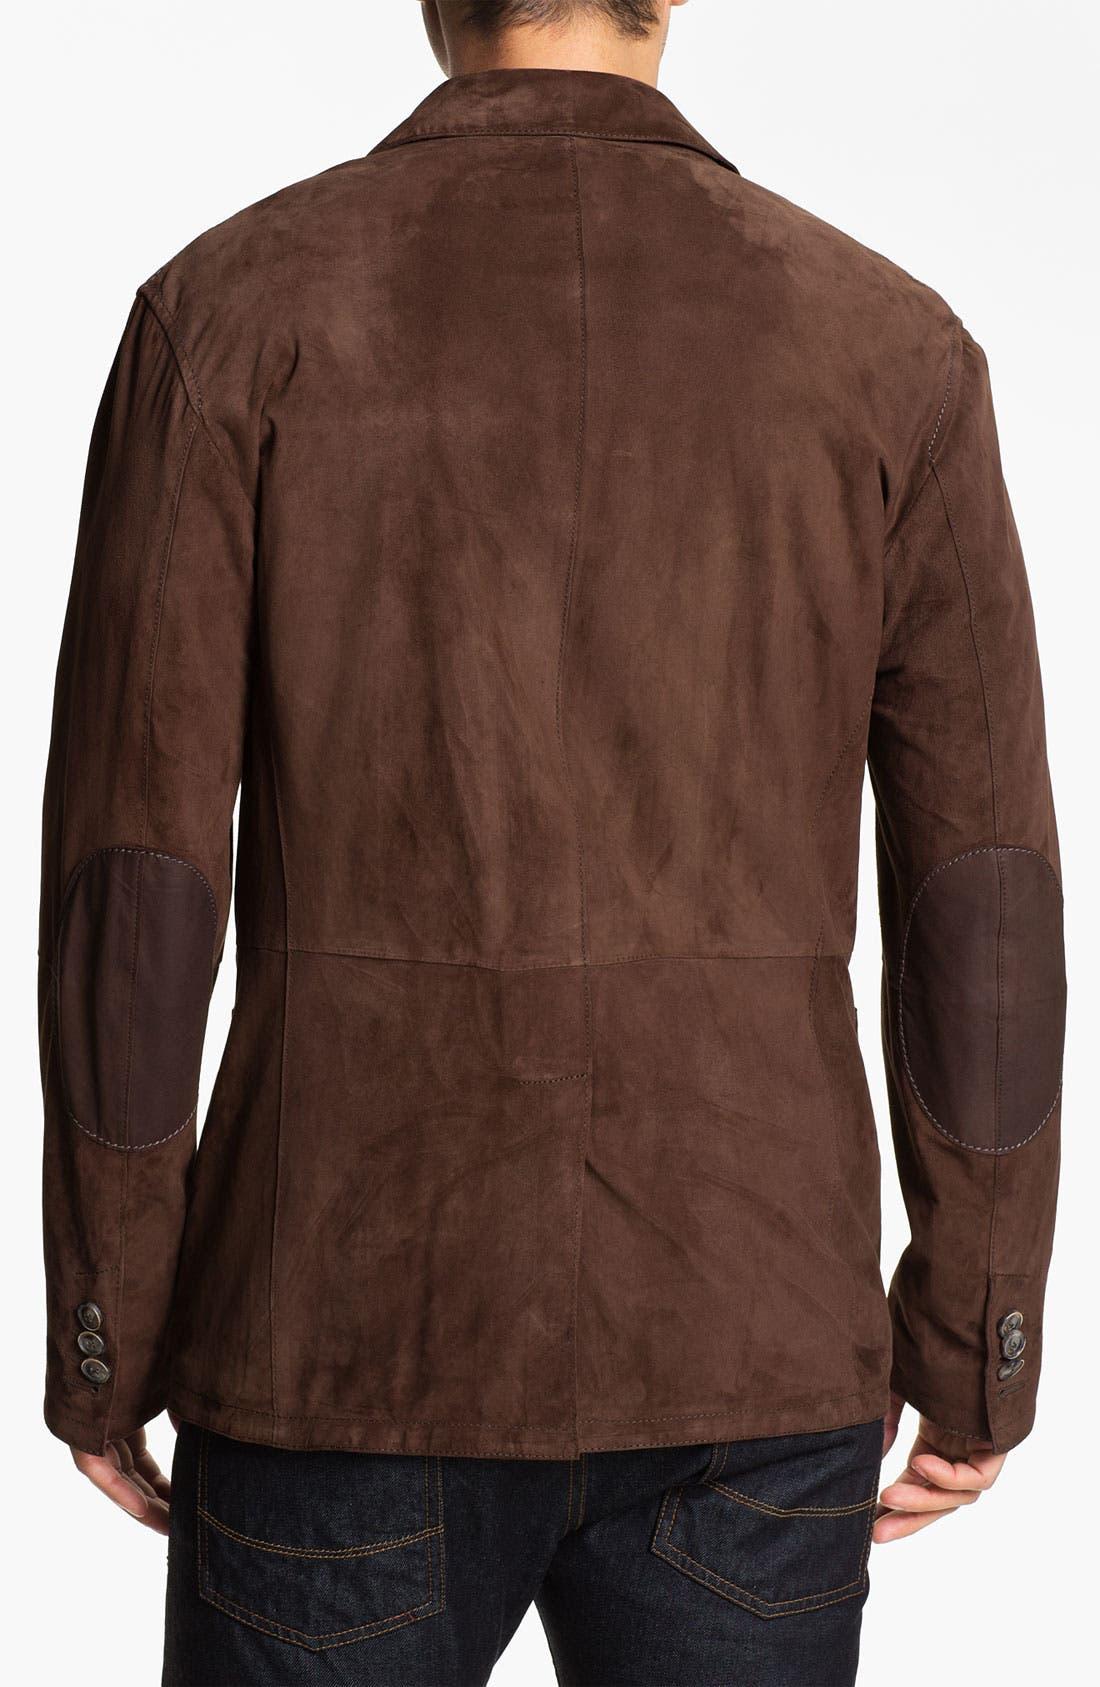 Goatskin Suede Jacket,                             Alternate thumbnail 3, color,                             200